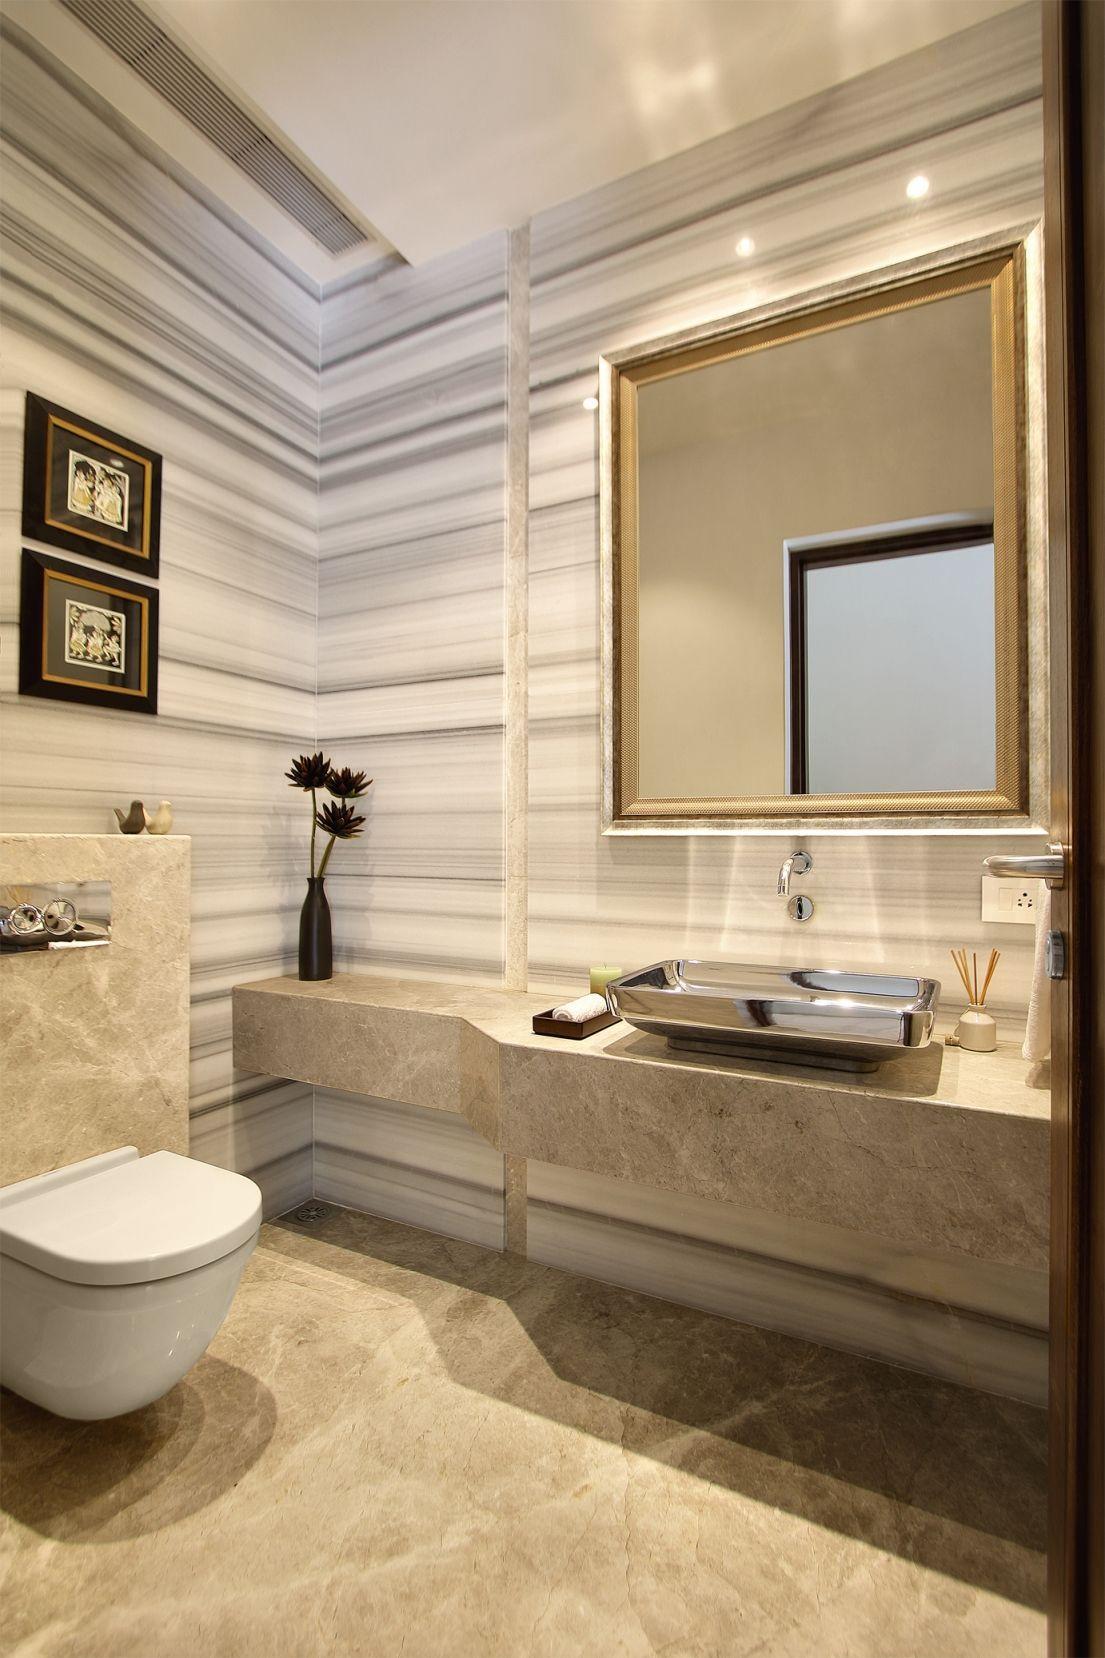 EXQUISITE DESIGN BY ARCHITECT DIPIN GADA /India # ...